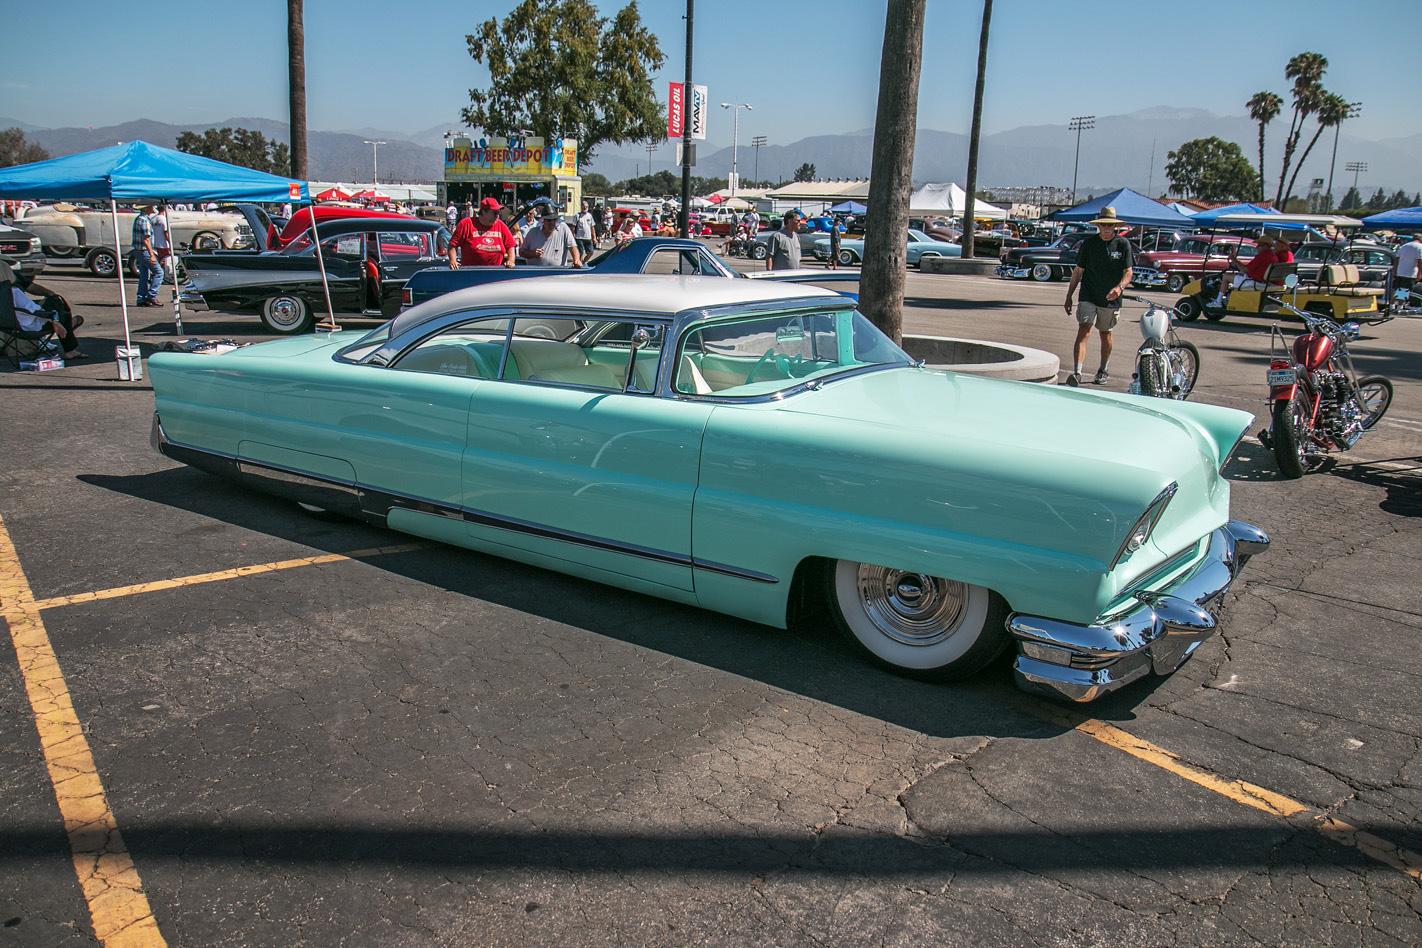 LA-roadster -show -5